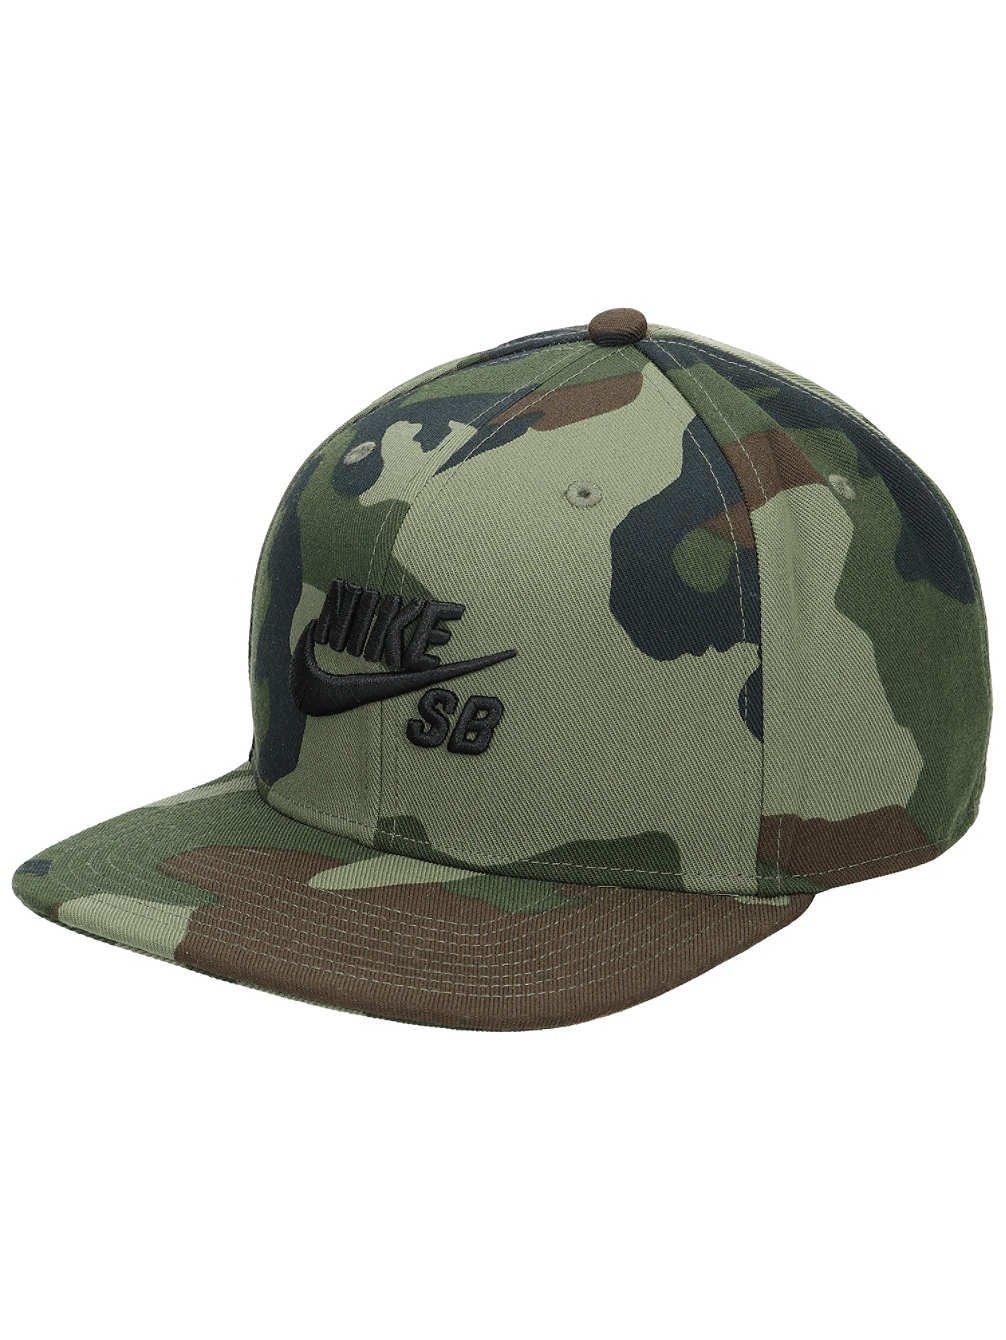 64bae064 Nike SB Hat U NK Snapback Pro Camo: Amazon.com.au: Fashion